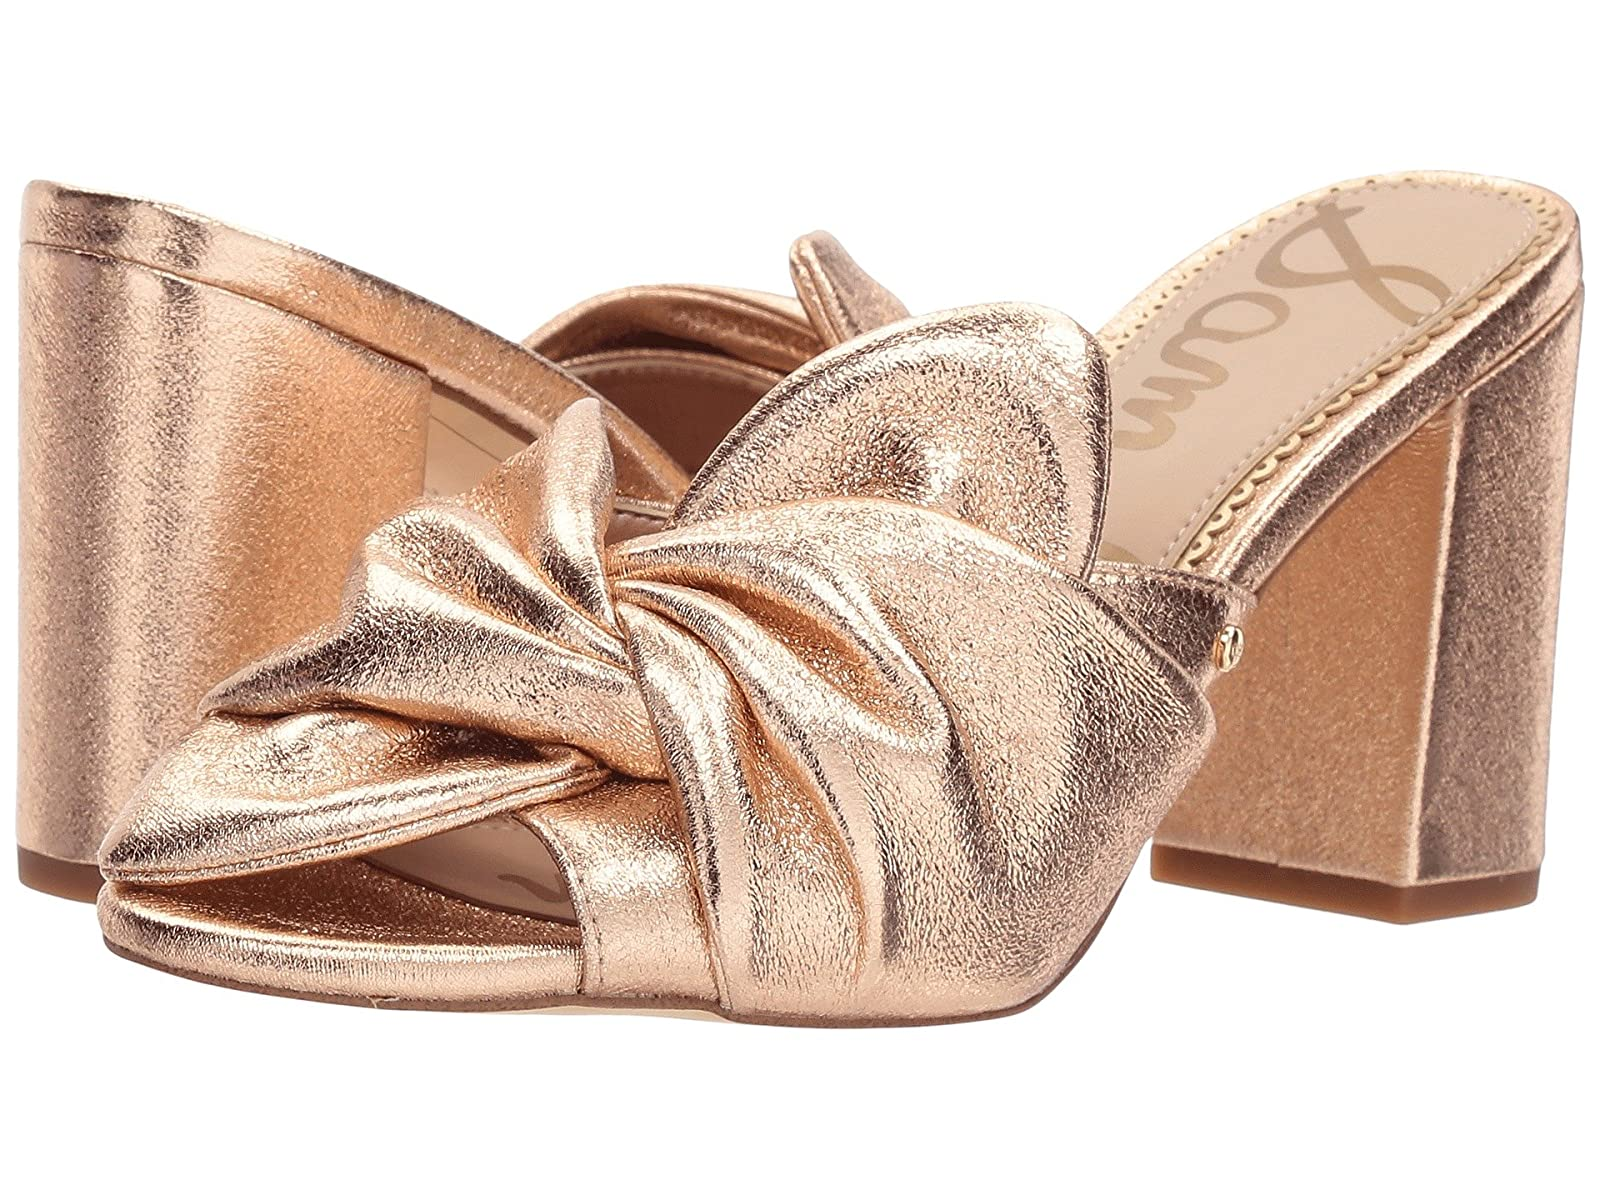 Sam Edelman OdaCheap and distinctive eye-catching shoes